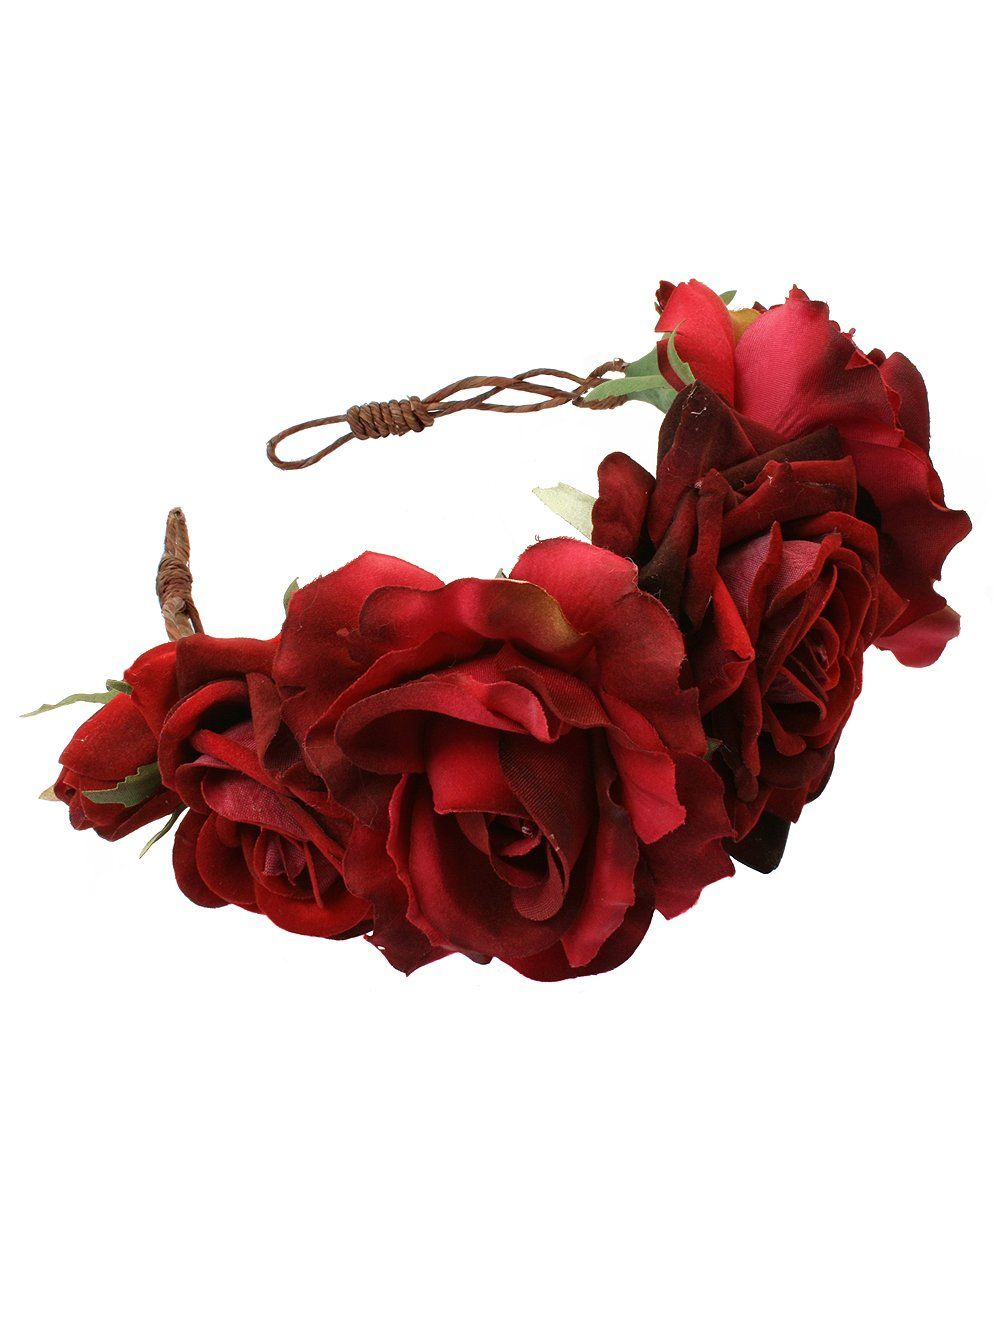 Beatrice oversized floral crown headband rock n rose from rock n beatrice oversized floral crown headband rock n rose from rock n rose uk izmirmasajfo